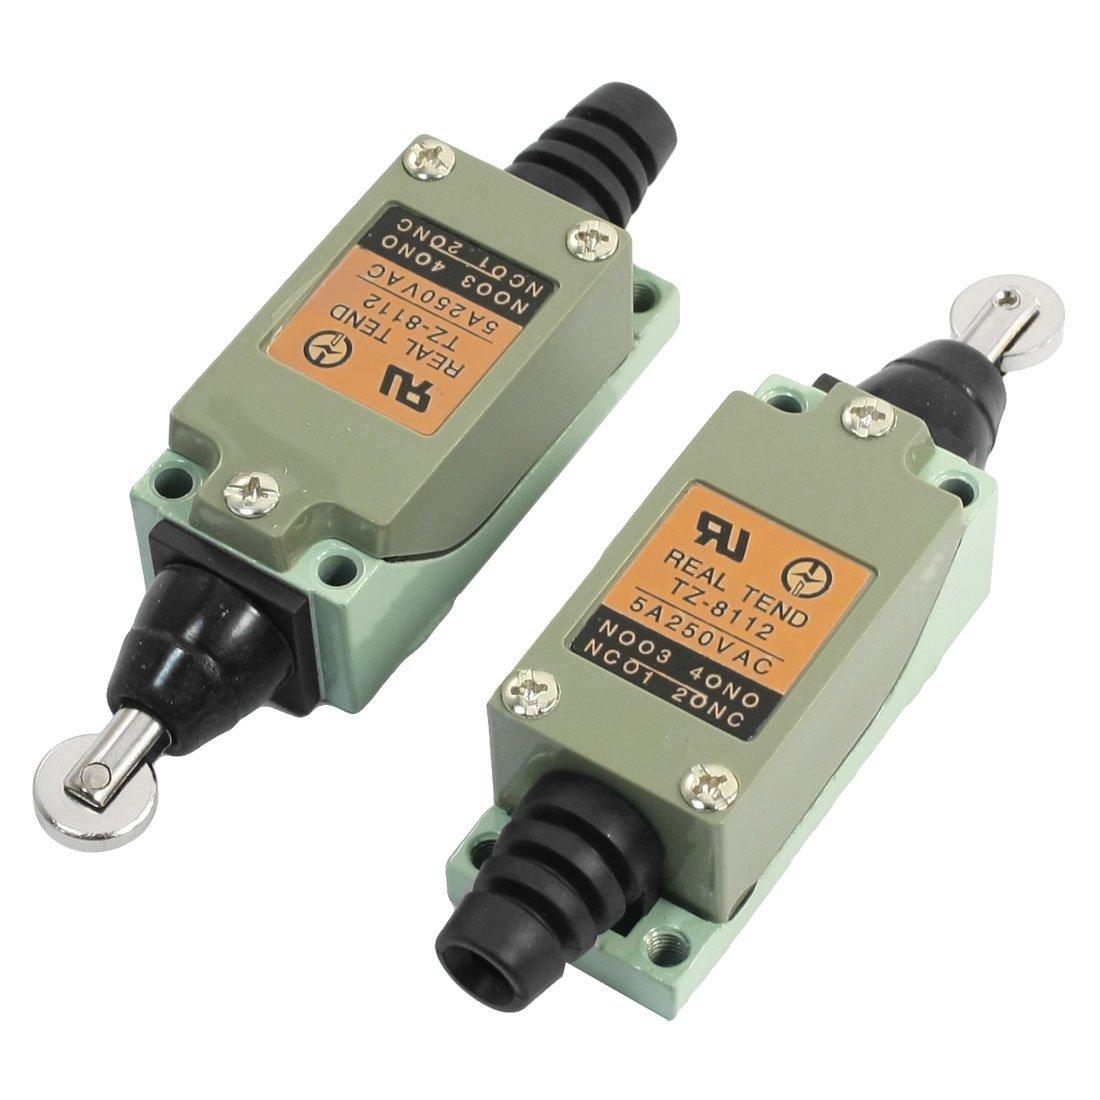 2PCS 5 a 250 VAC parallelo roller Plunger no + NC chiuso finecorsa Sourcingmap a14011400ux0345